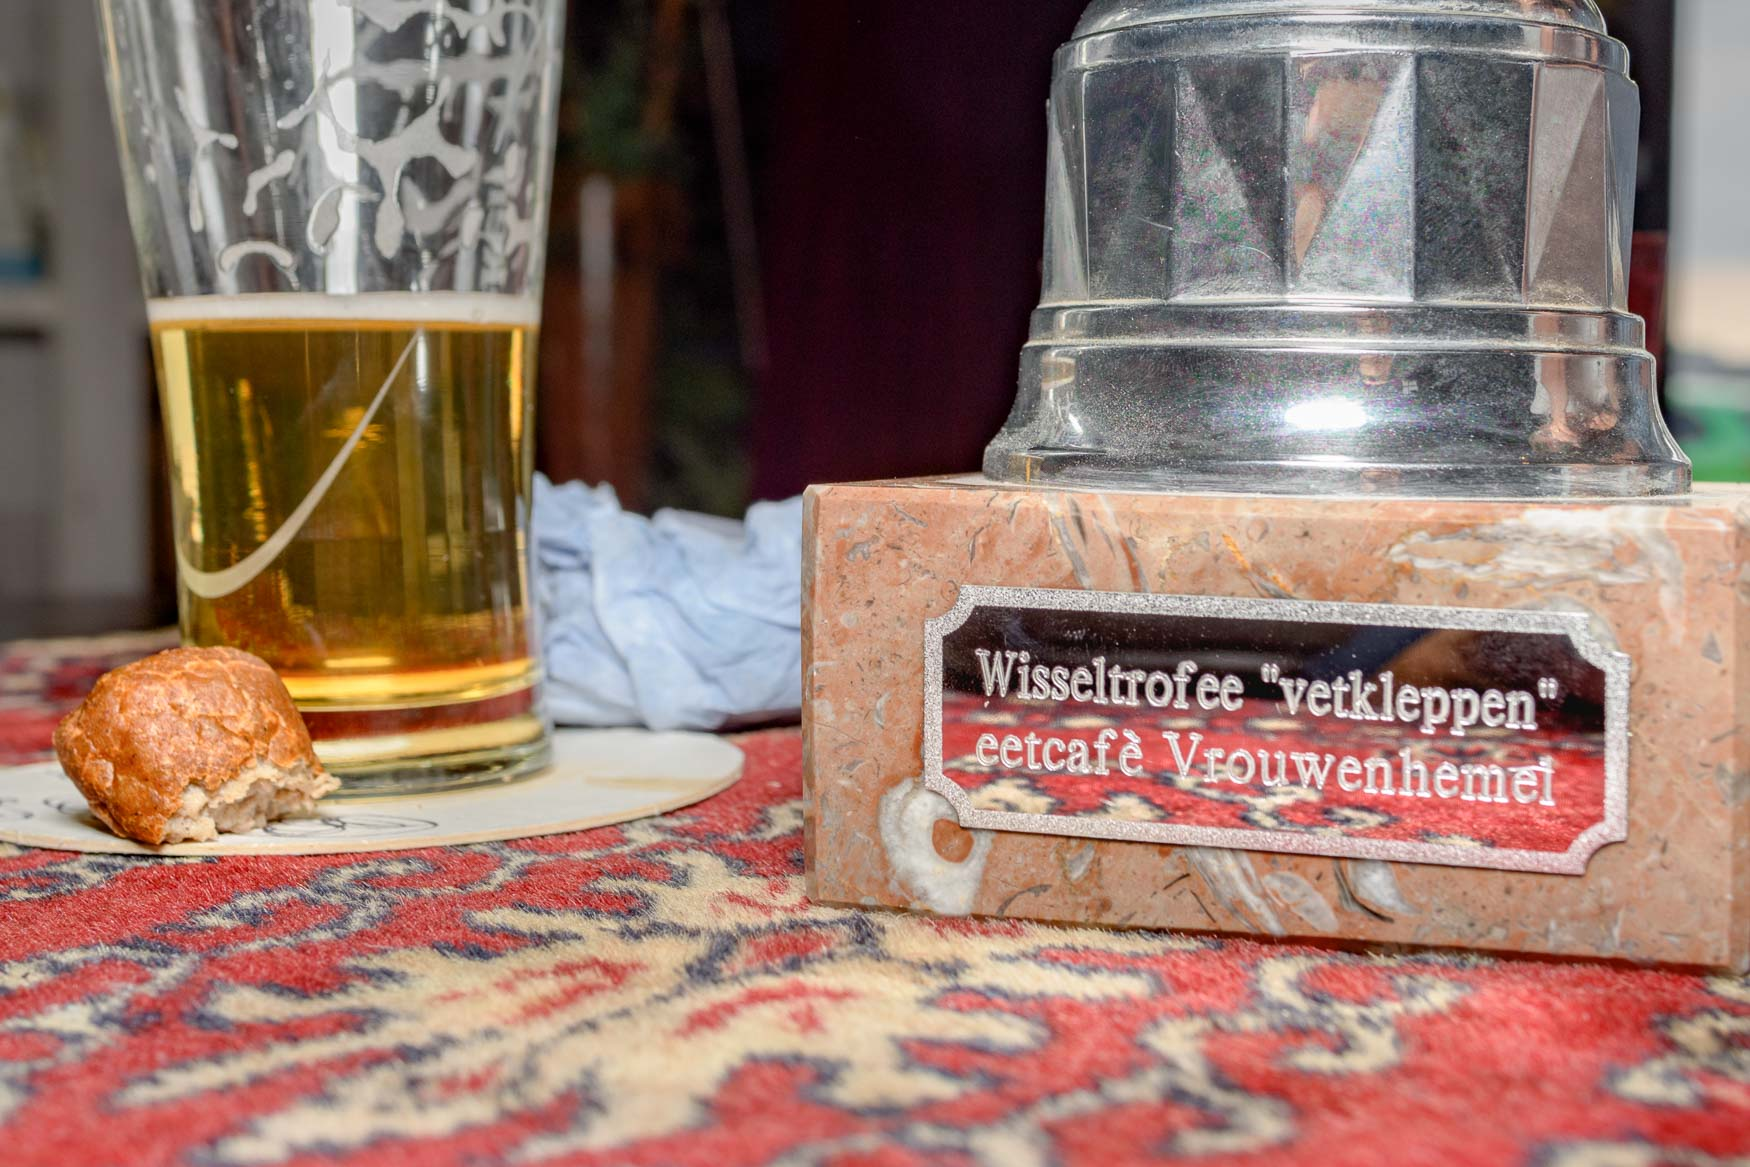 7e frikandellen eetwedstrijd in Cafe Vrouwenhemel te Werkendam   Sas Schilten Fotografie